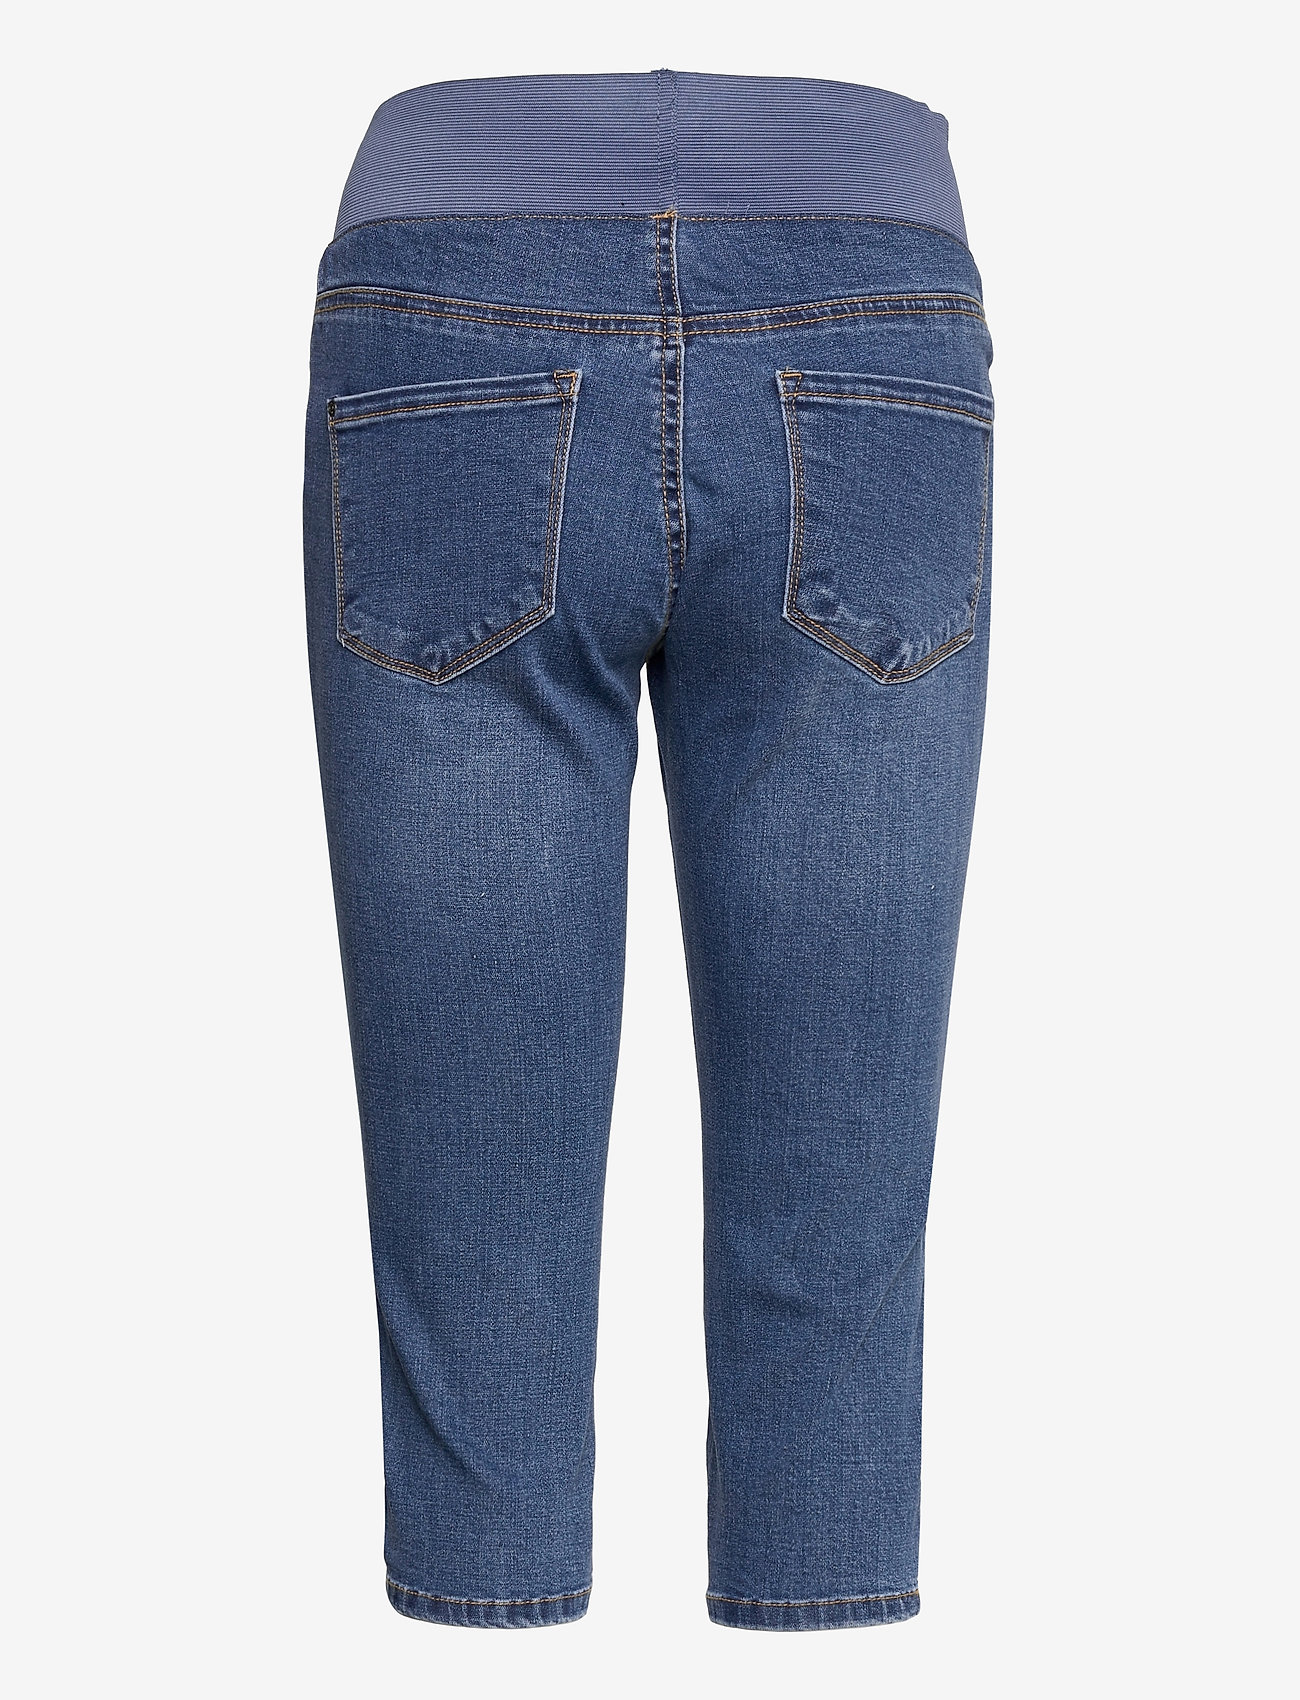 FREE/QUENT - SHANTAL-CA-DENIM - capribroek - vintage blue denim - 1